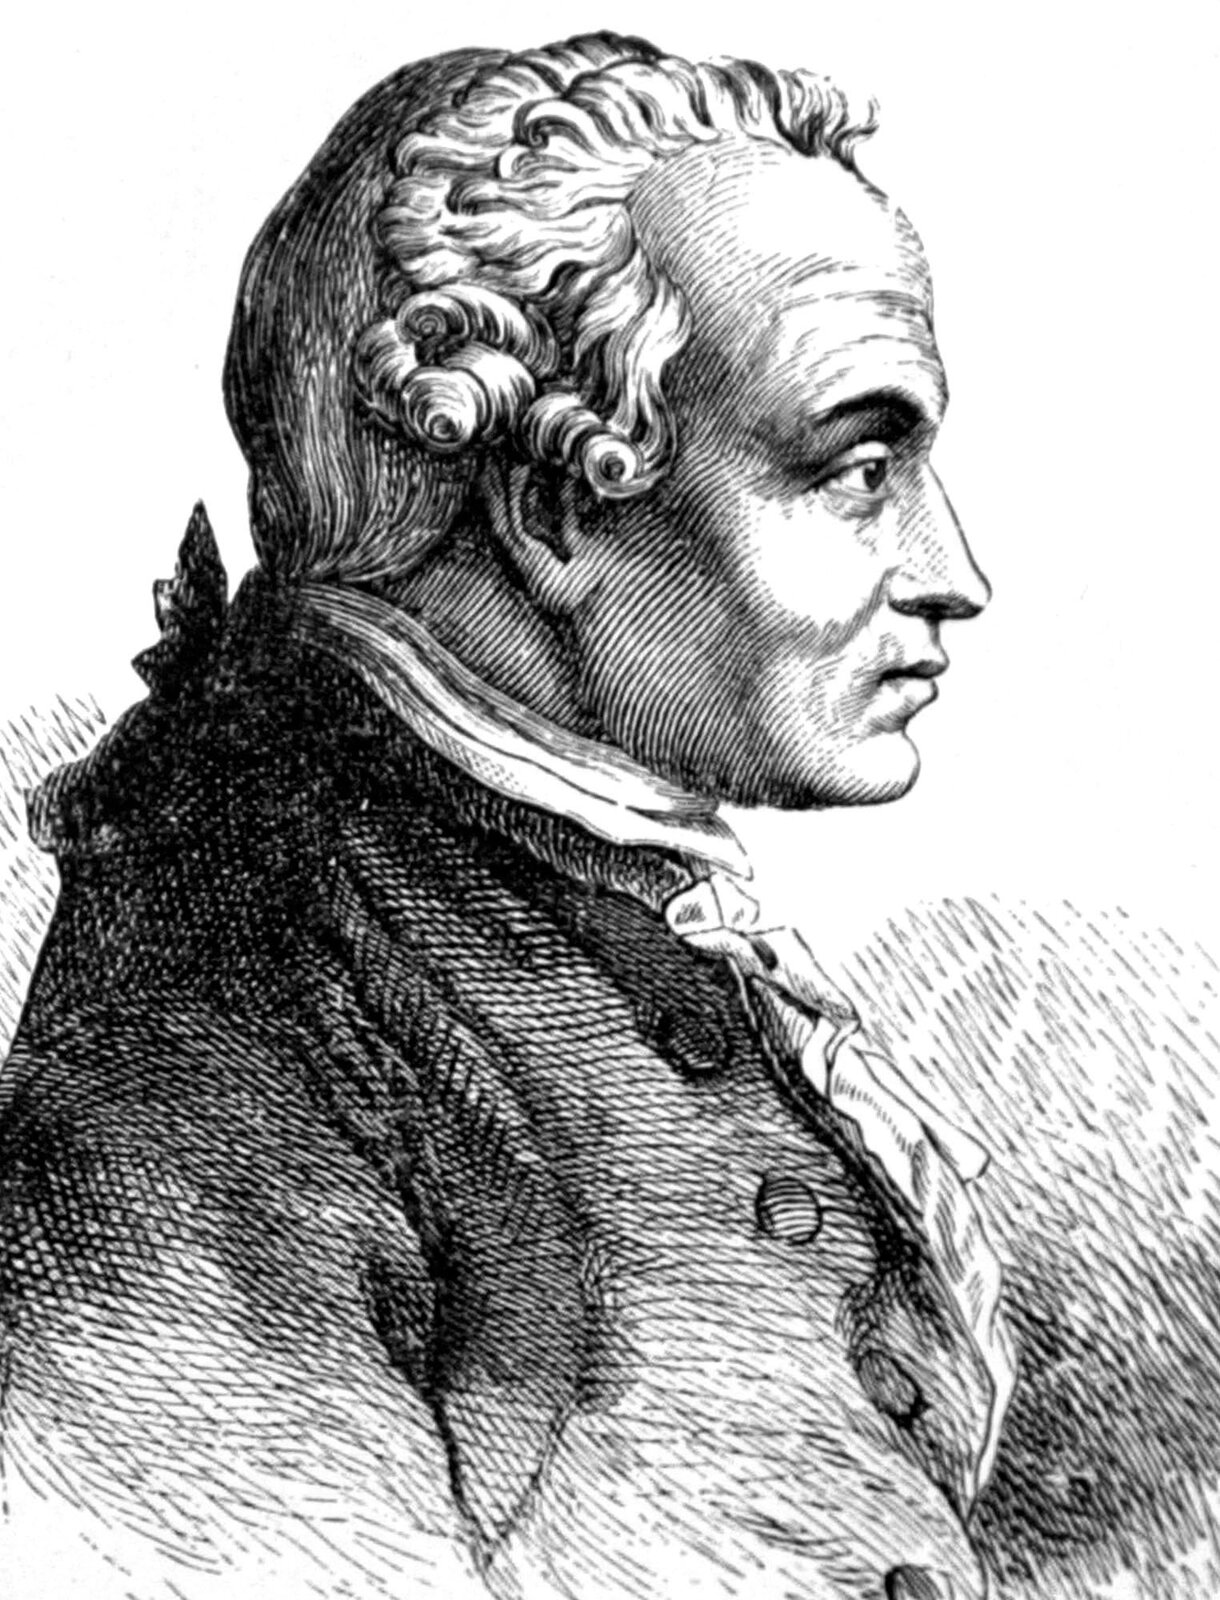 Immanuel Kant Immanuel Kant Źródło: Hans Schnorr, 1791, domena publiczna.